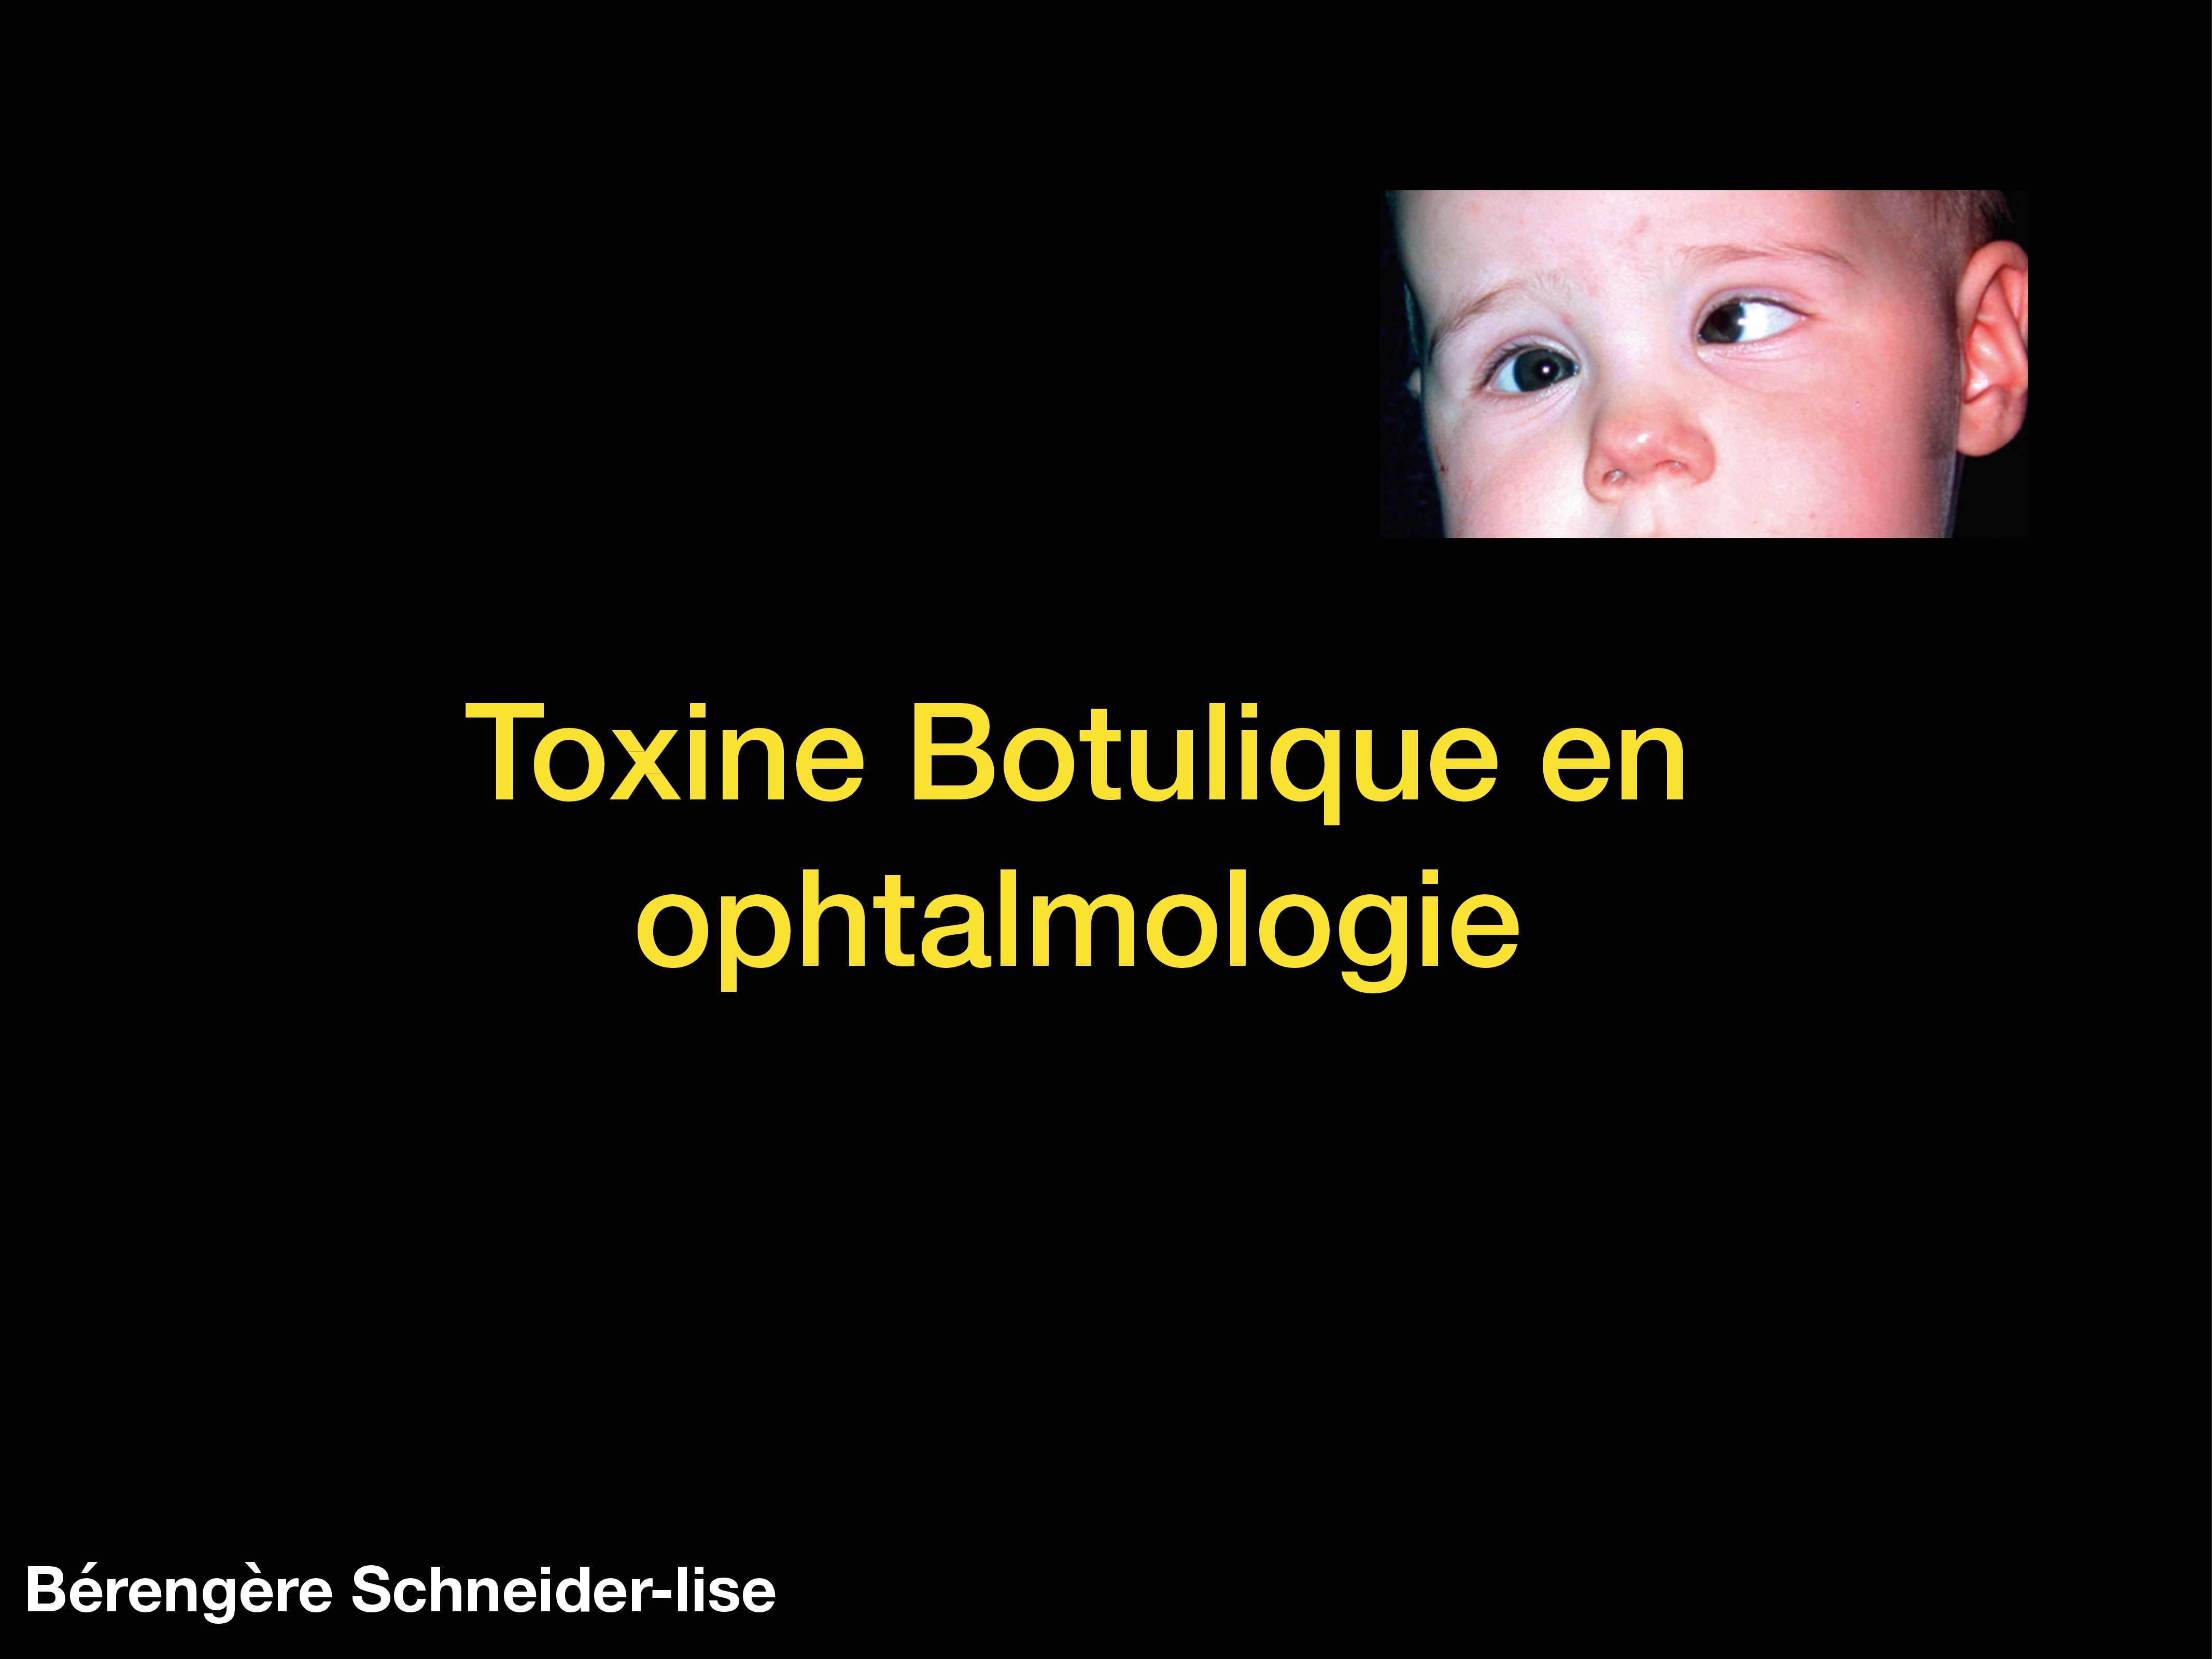 toxine botulique ophtalmologie